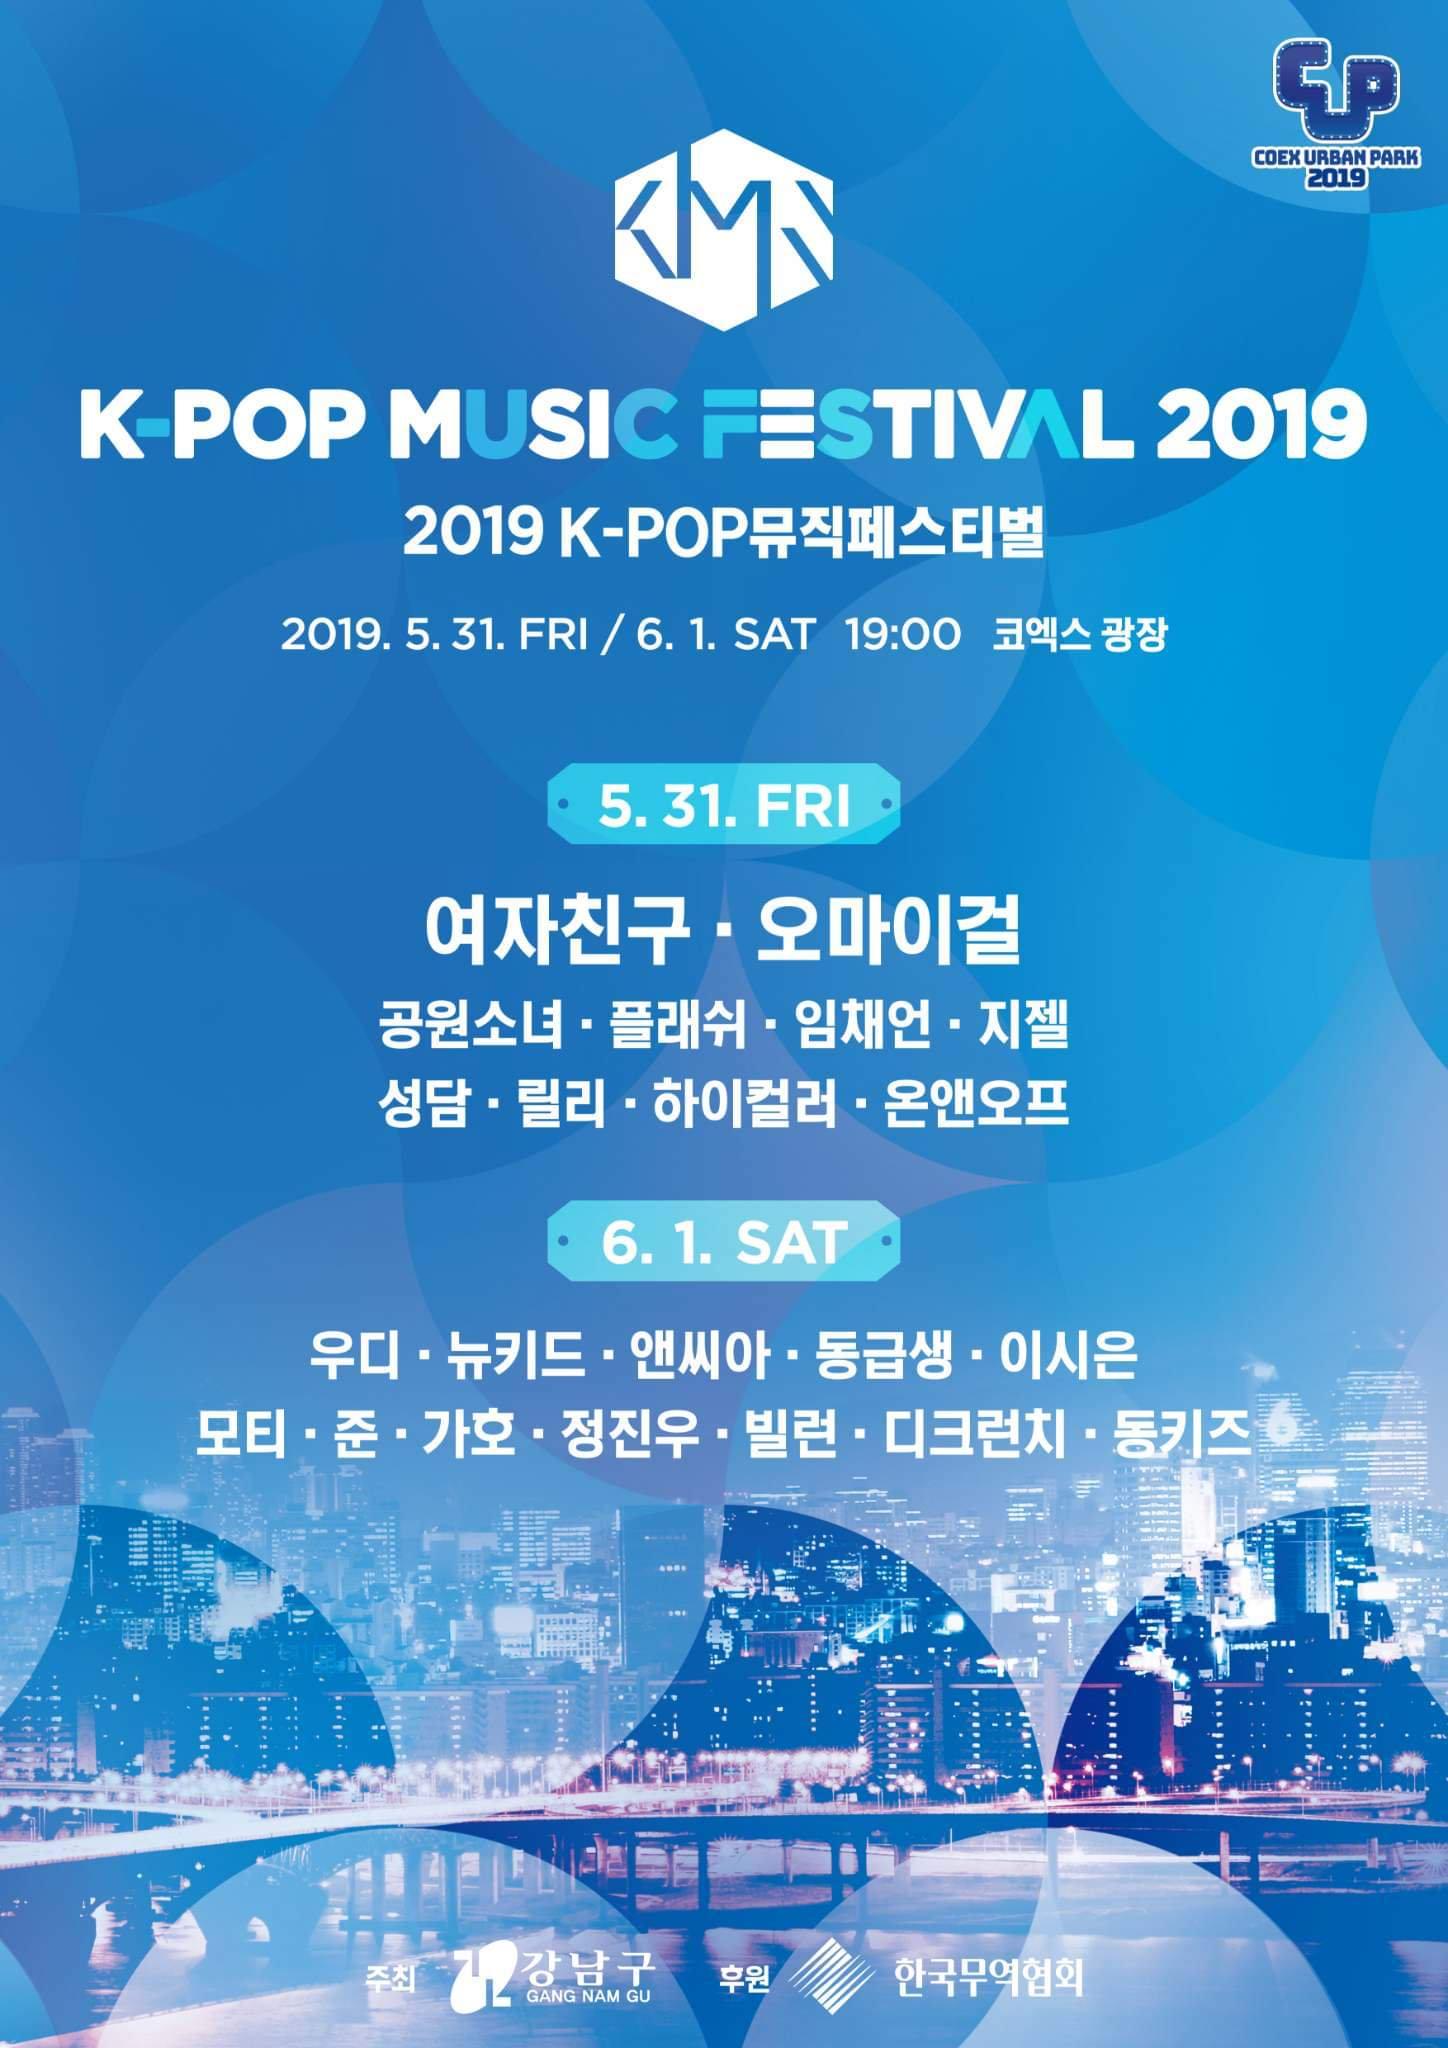 kpop music festival, kpop music festival lineup, kmf, kmf 2019, gfriend, oh my girl, onf,